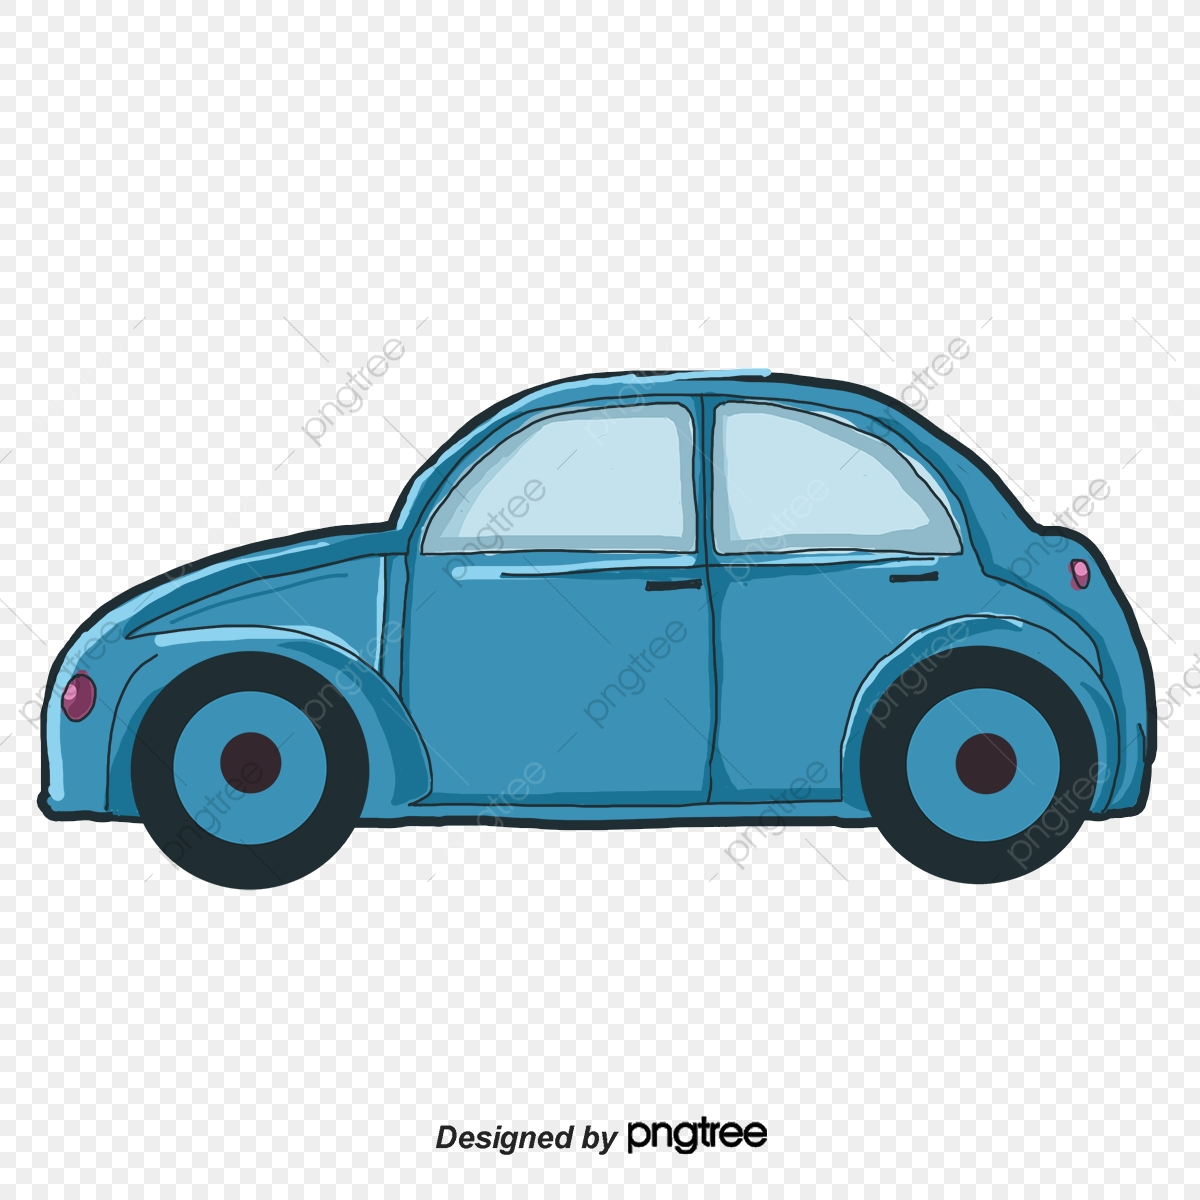 Yellow Car Cartoon Car Classic Cars Car Illustration, Childrens Toy.